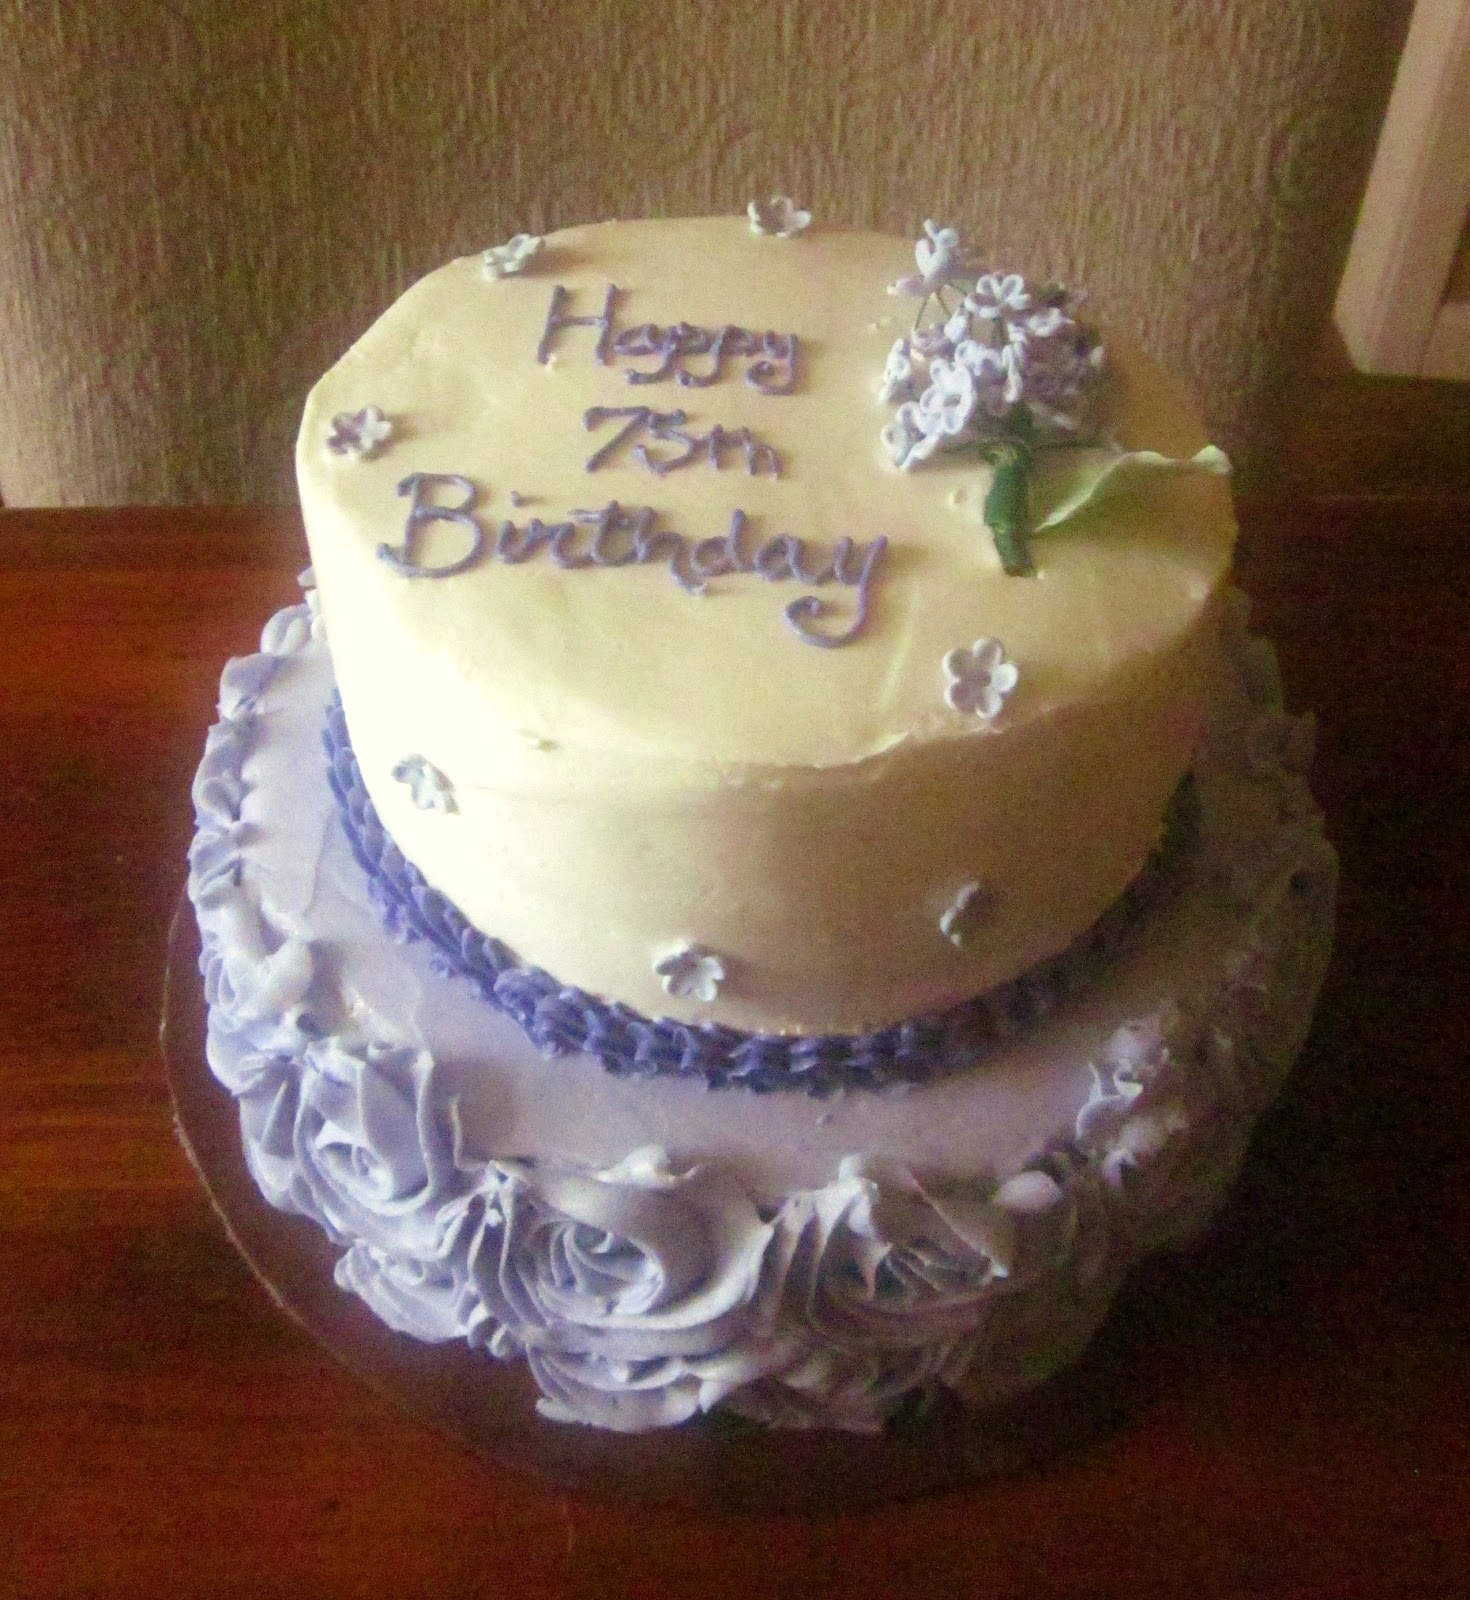 Second Generation Cake Design Roses Lilacs 75th Birthday Cake